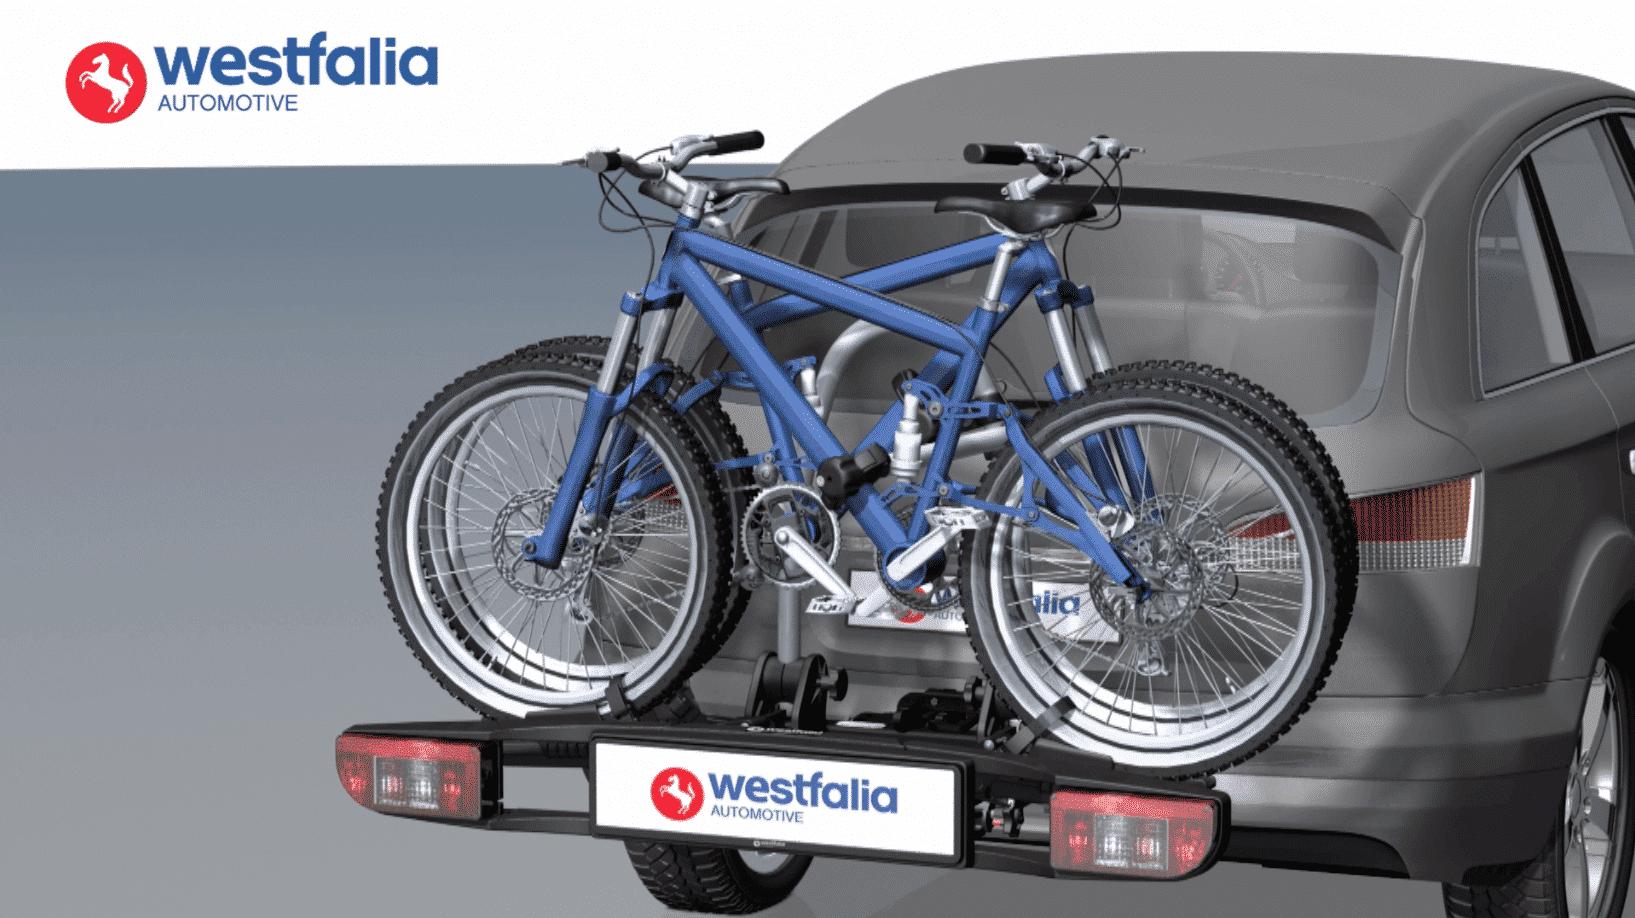 westfalia automotive animation fahrradtr ger bc70 my cms. Black Bedroom Furniture Sets. Home Design Ideas